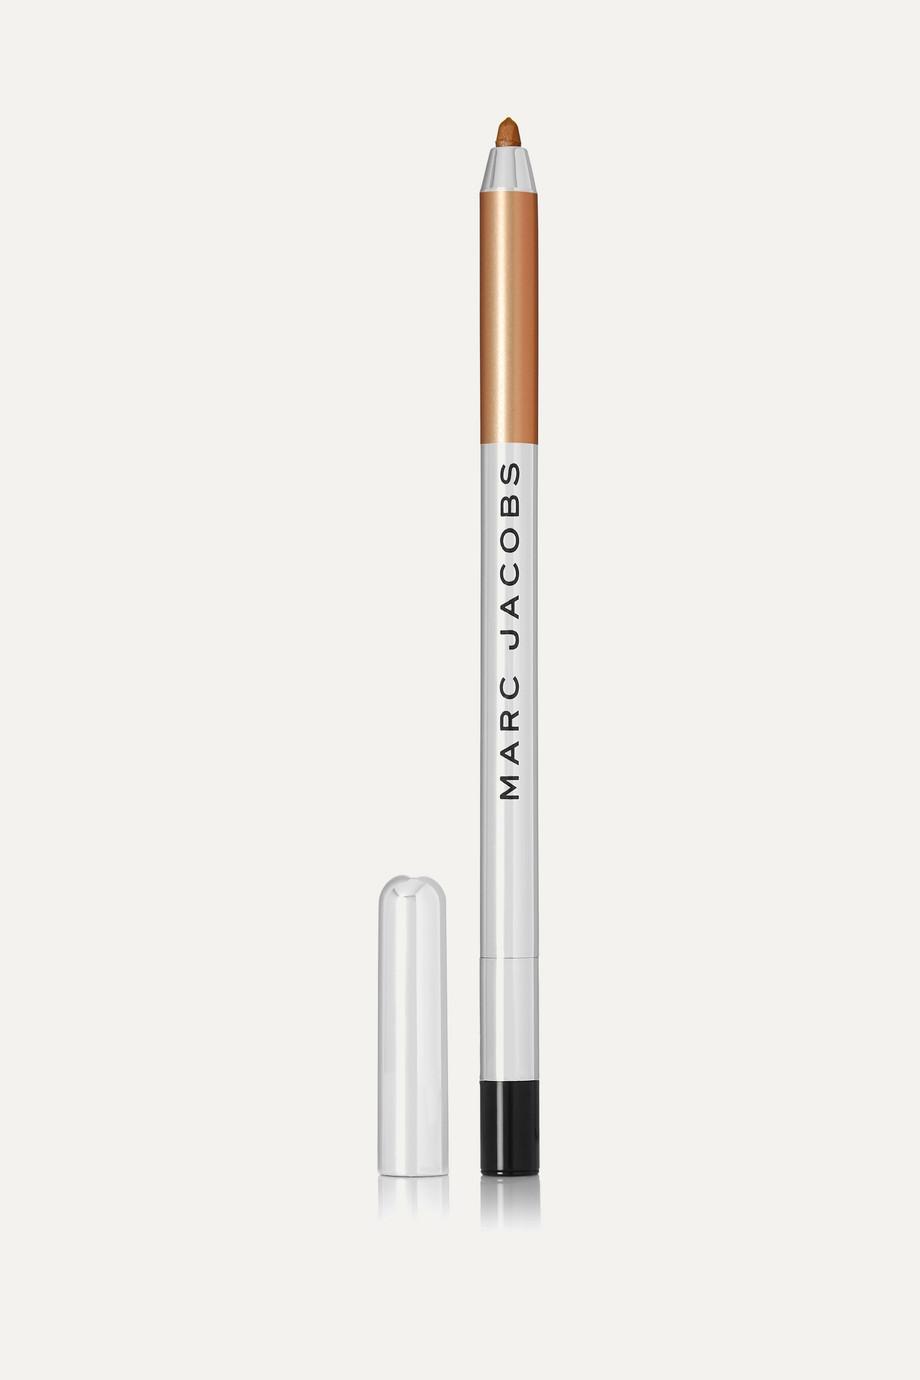 Marc Jacobs Beauty 亮彩眼线胶笔(色号:74 Sunset)